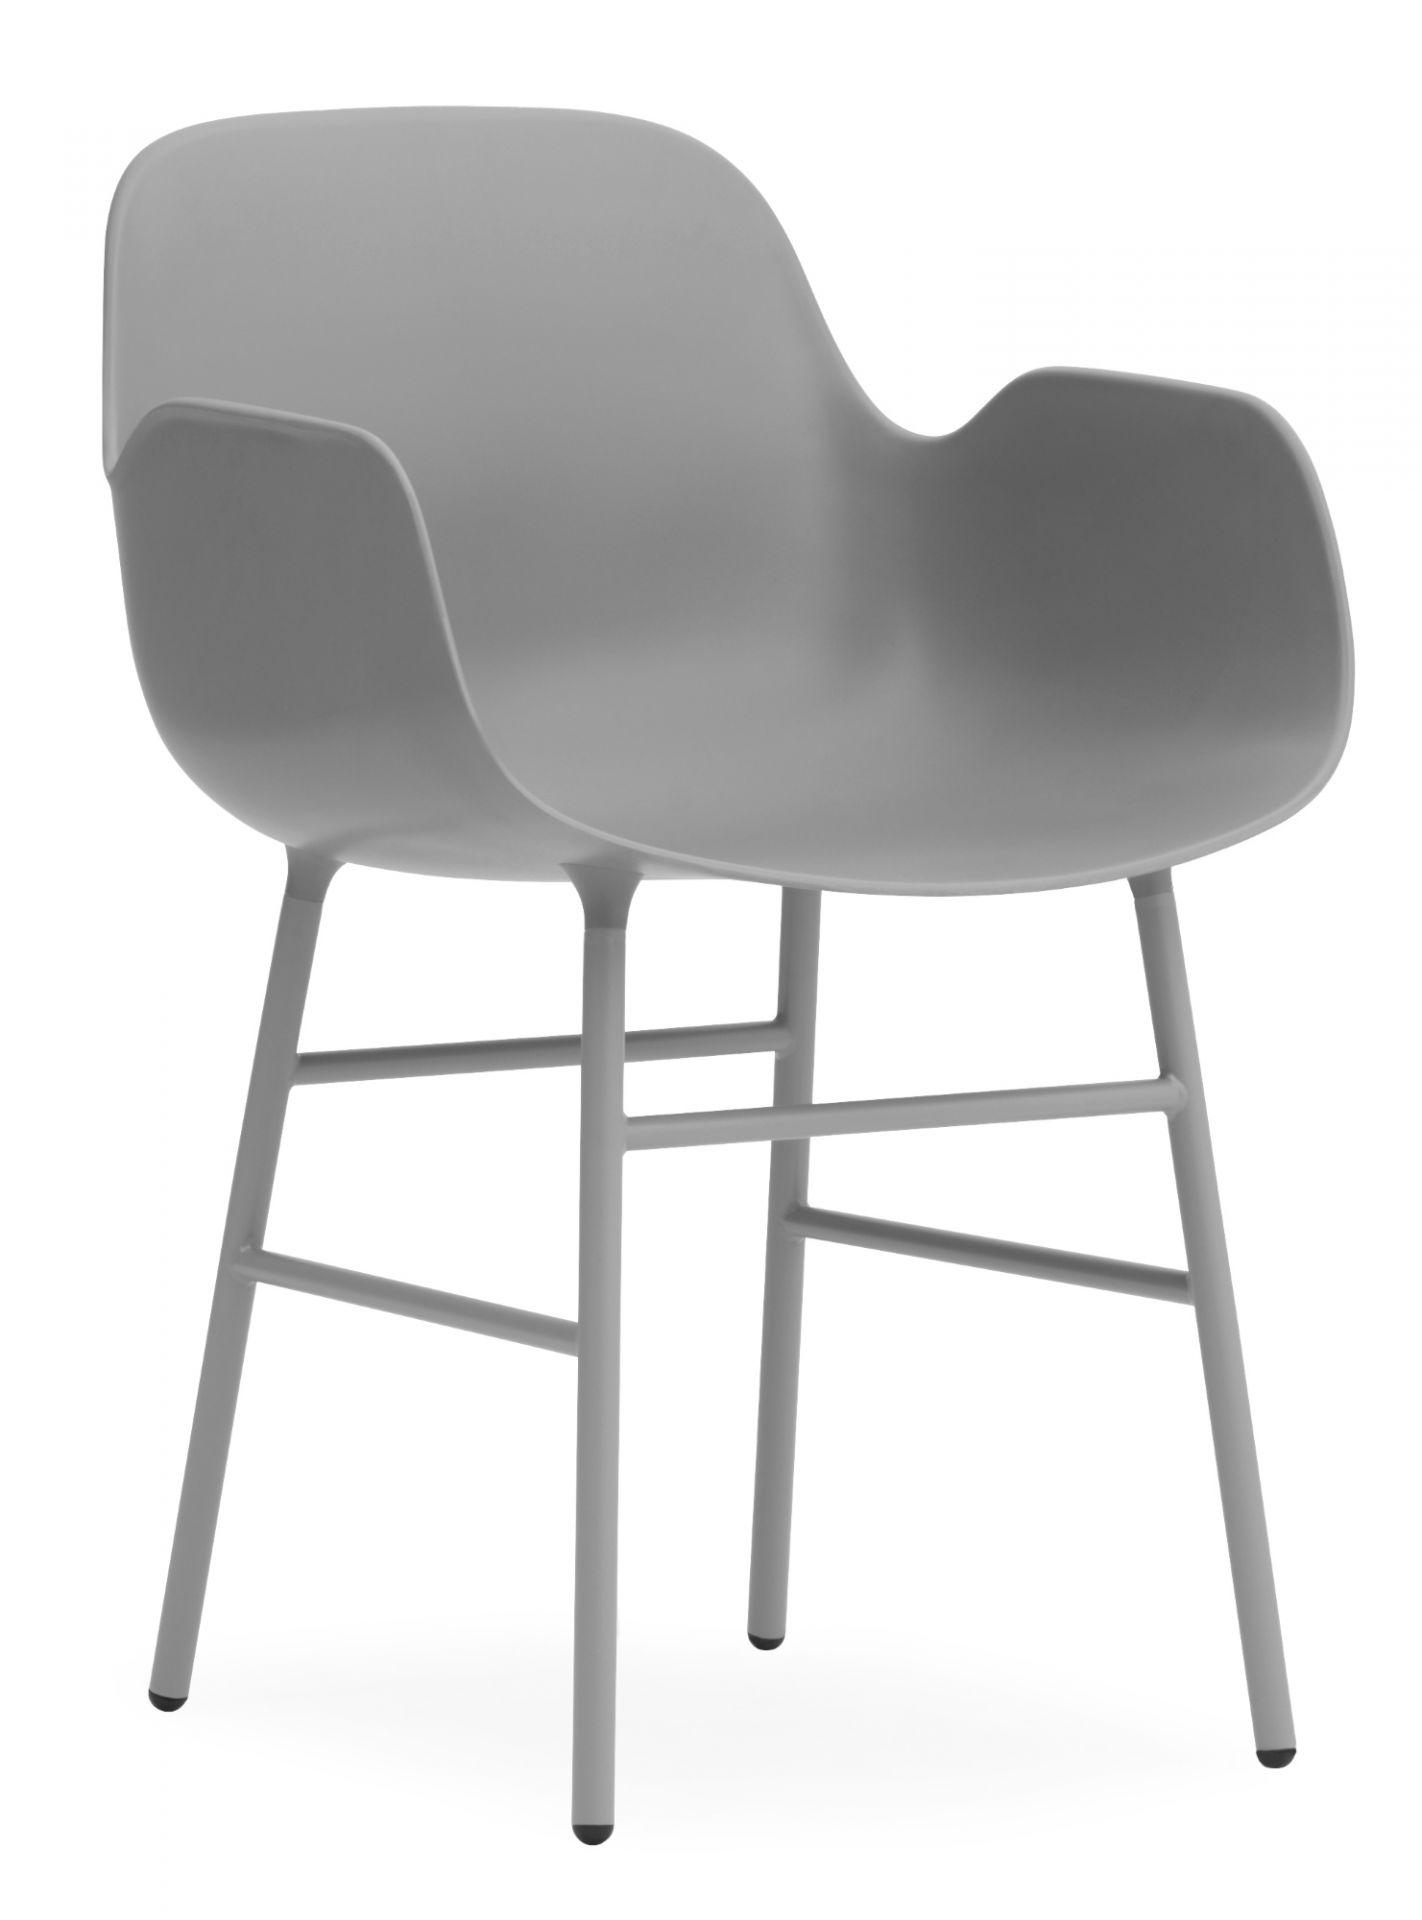 Form Armchair Lehnstuhl Normann Copenhagen-grau-Stahl